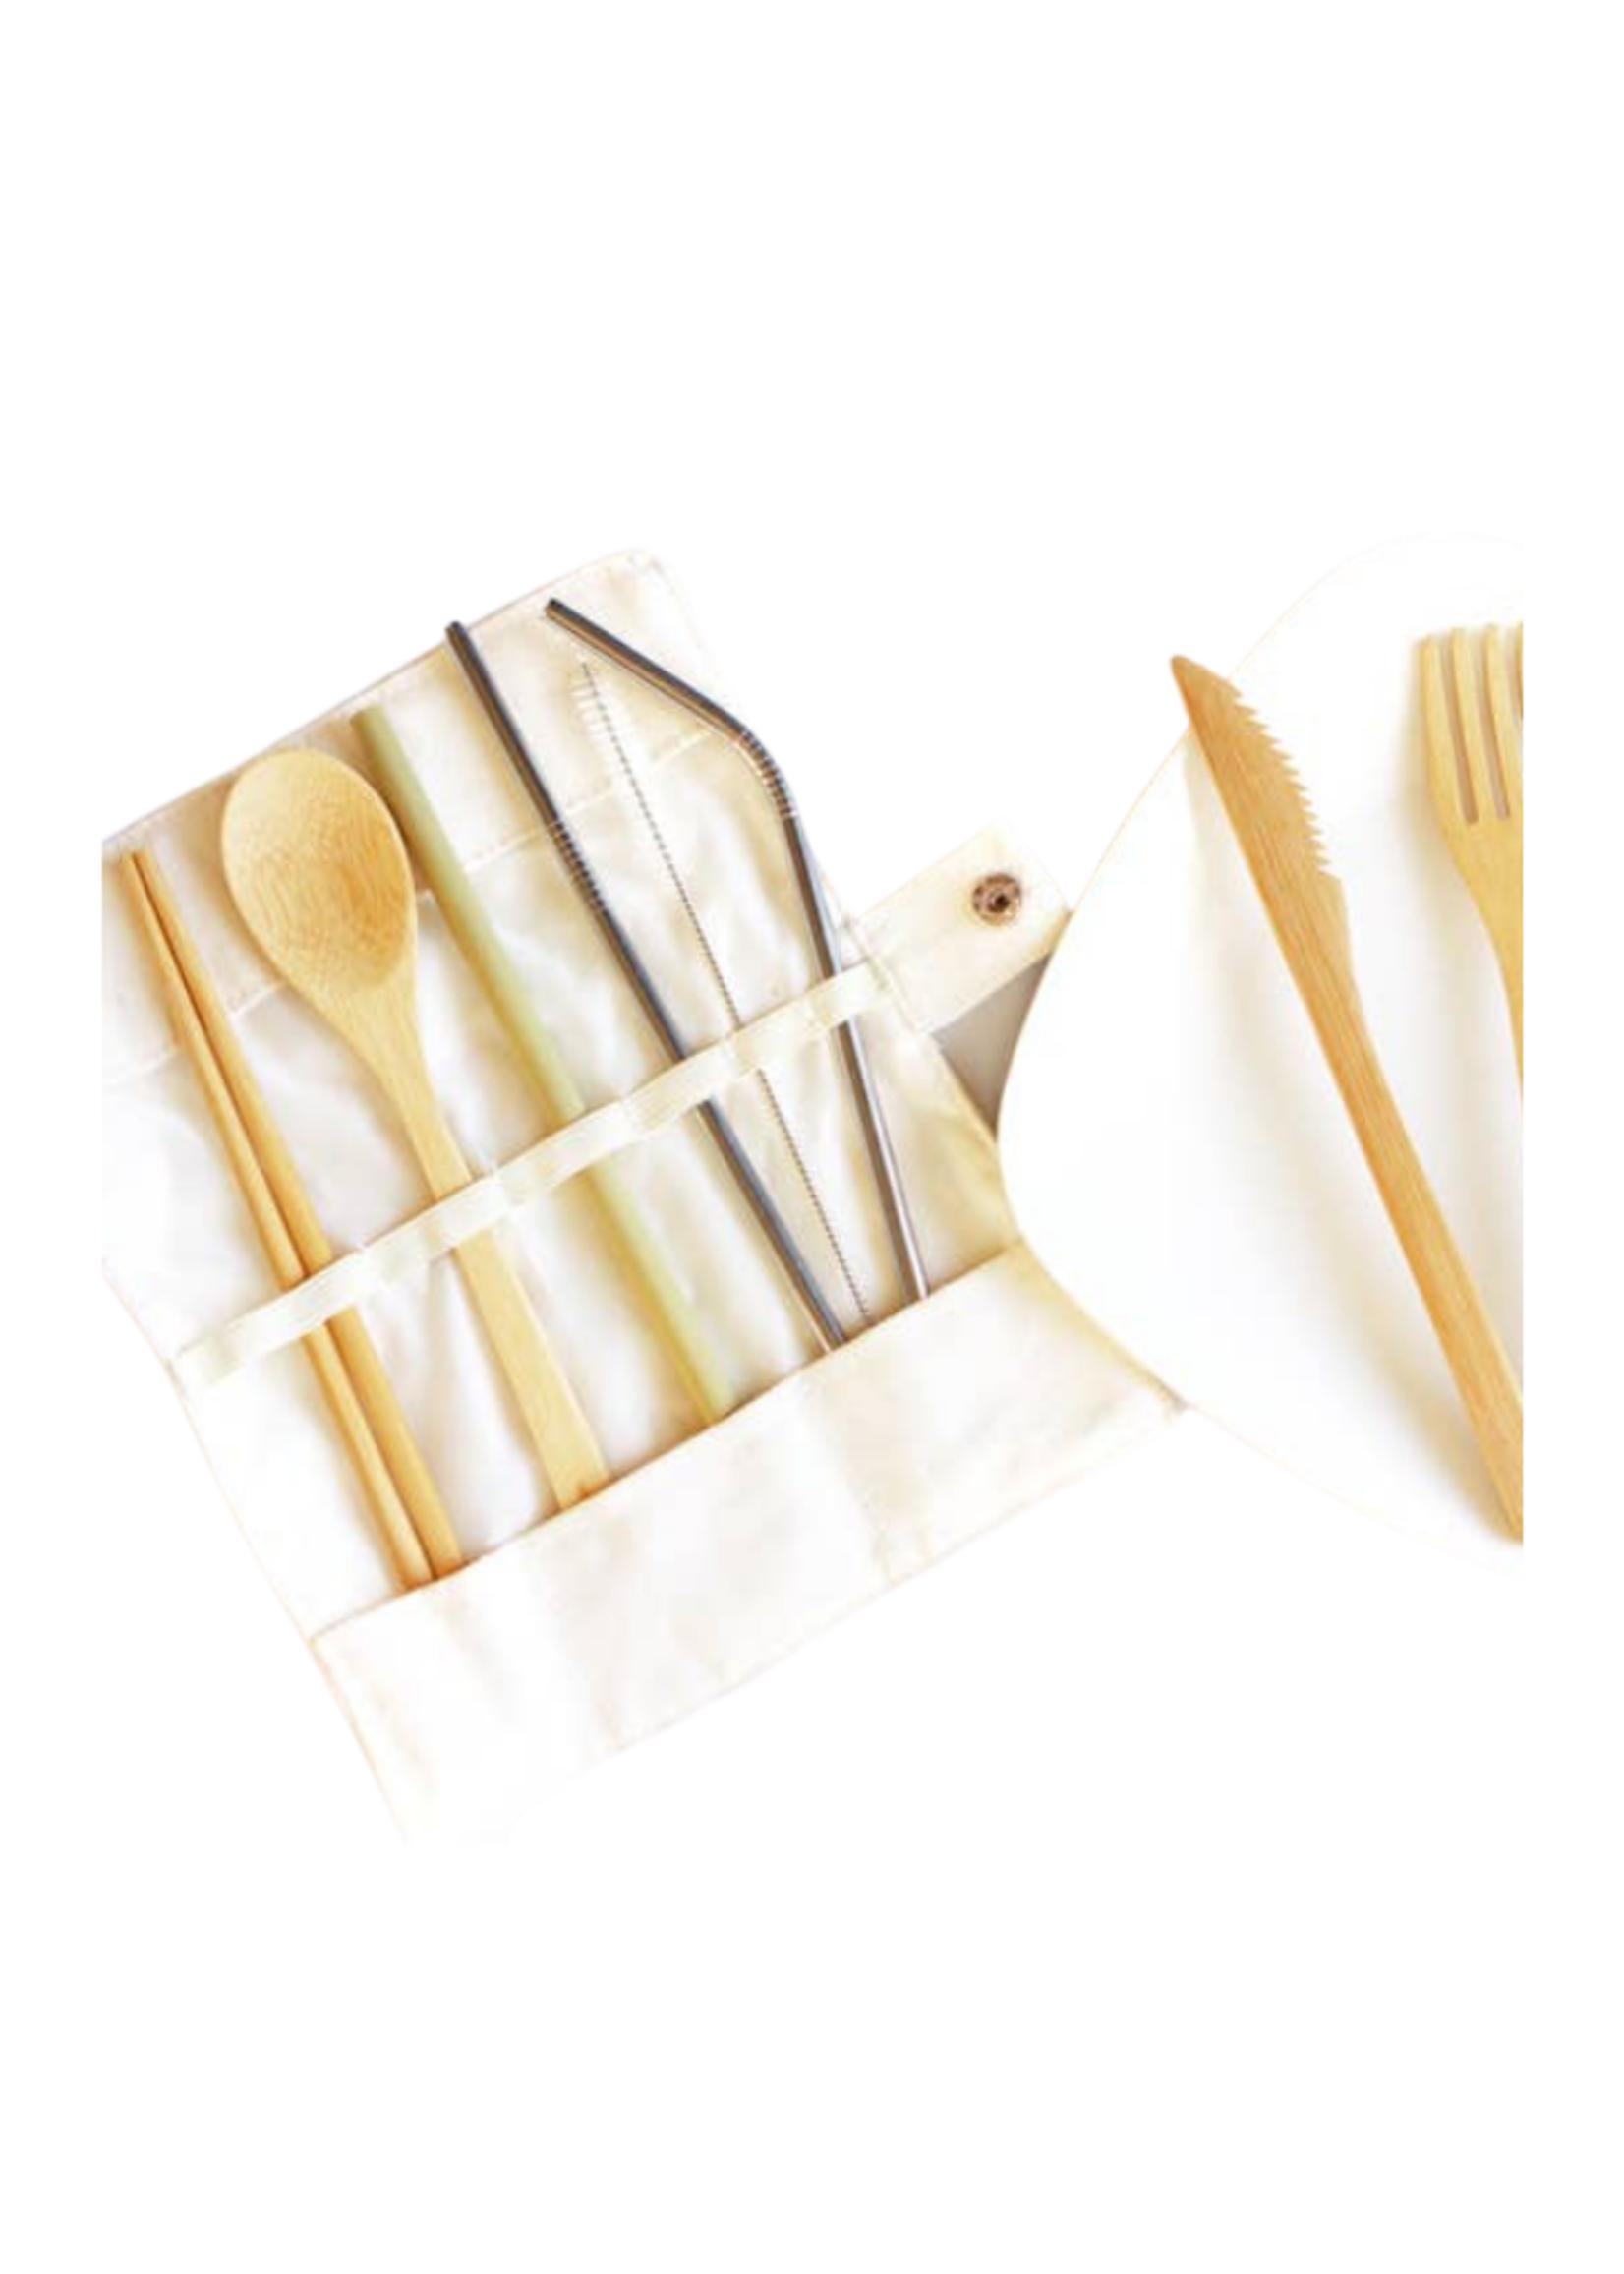 Last Straw Last Straw Eco-friendly Bamboo & Stainless Utensil Straw Set